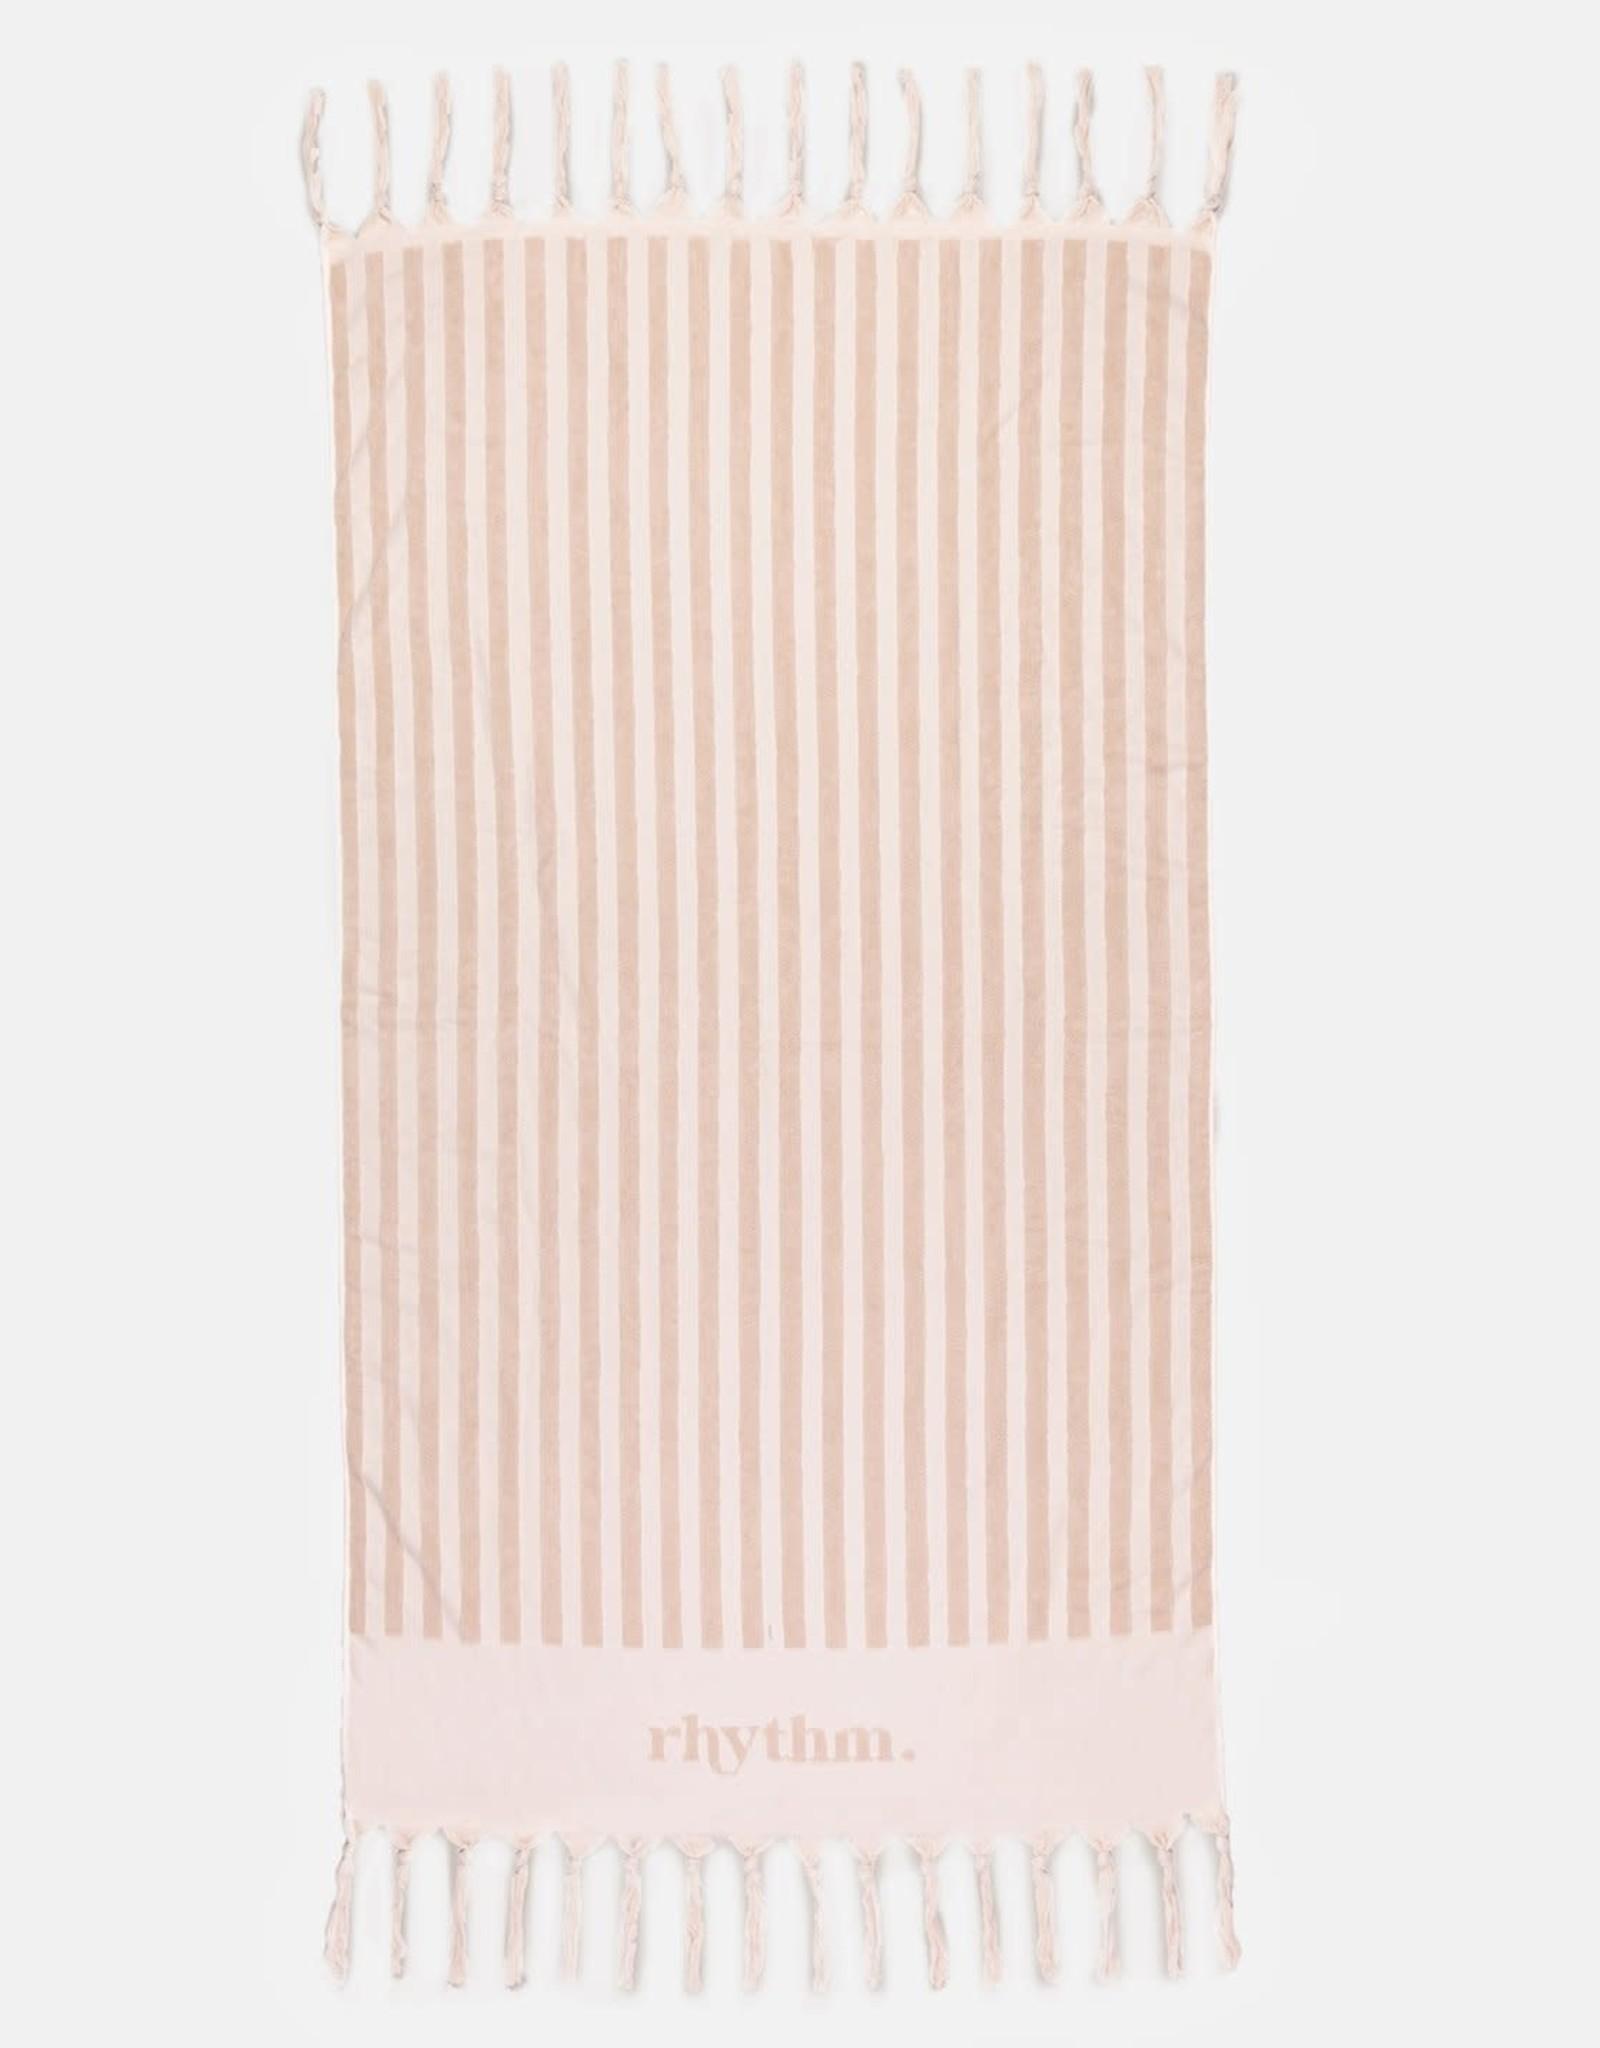 RHYTHM Ocean Shore Towel